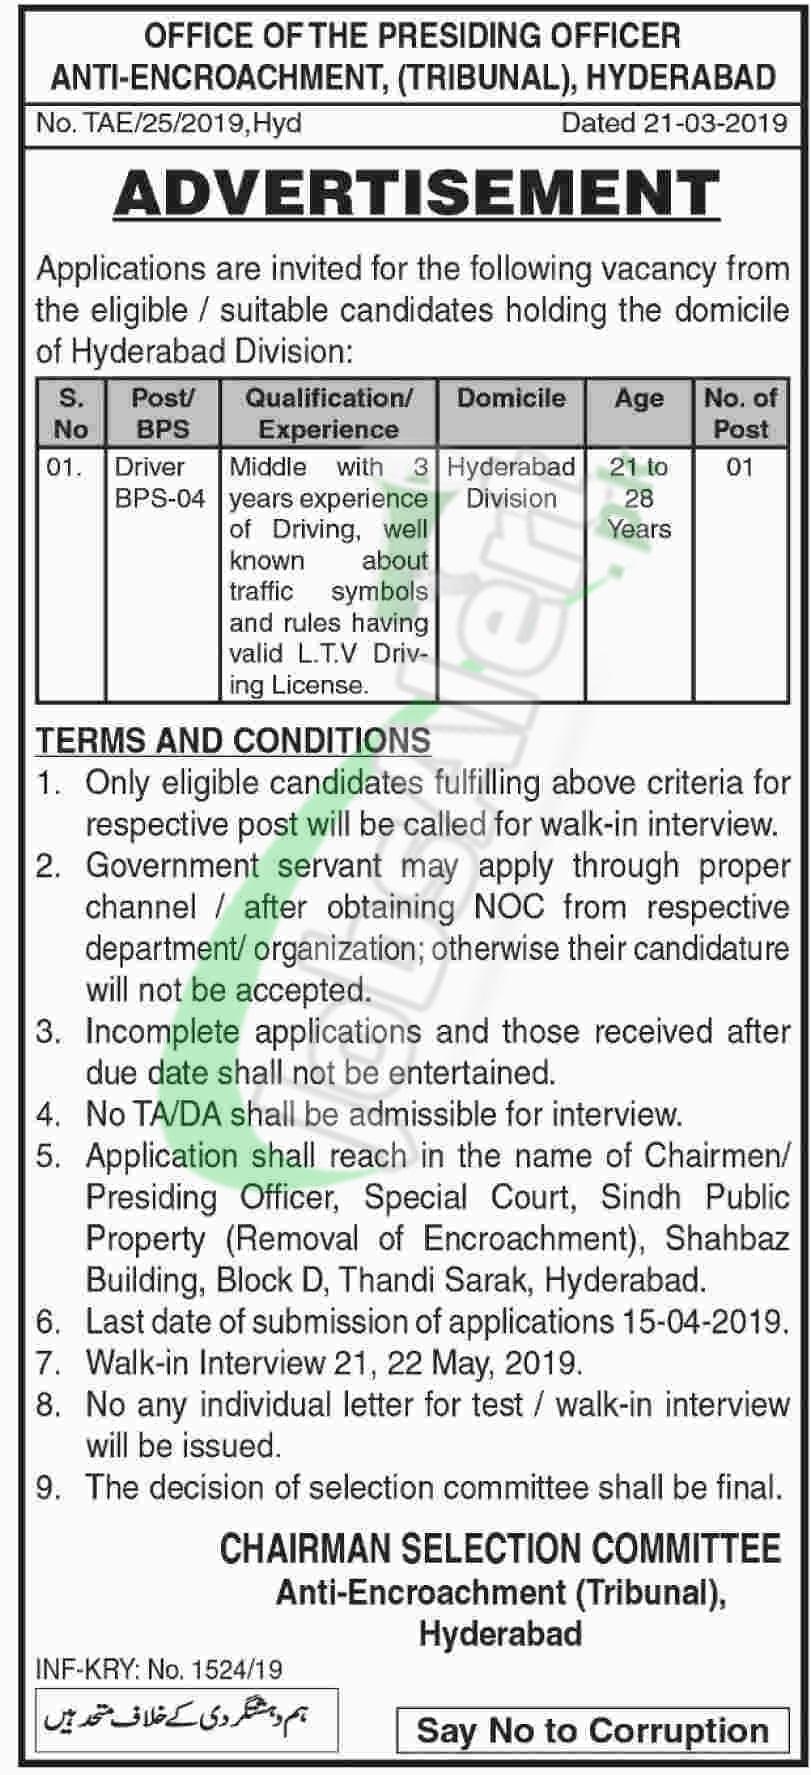 Tribunal Anti Encroachment Hyderabad Jobs 2019